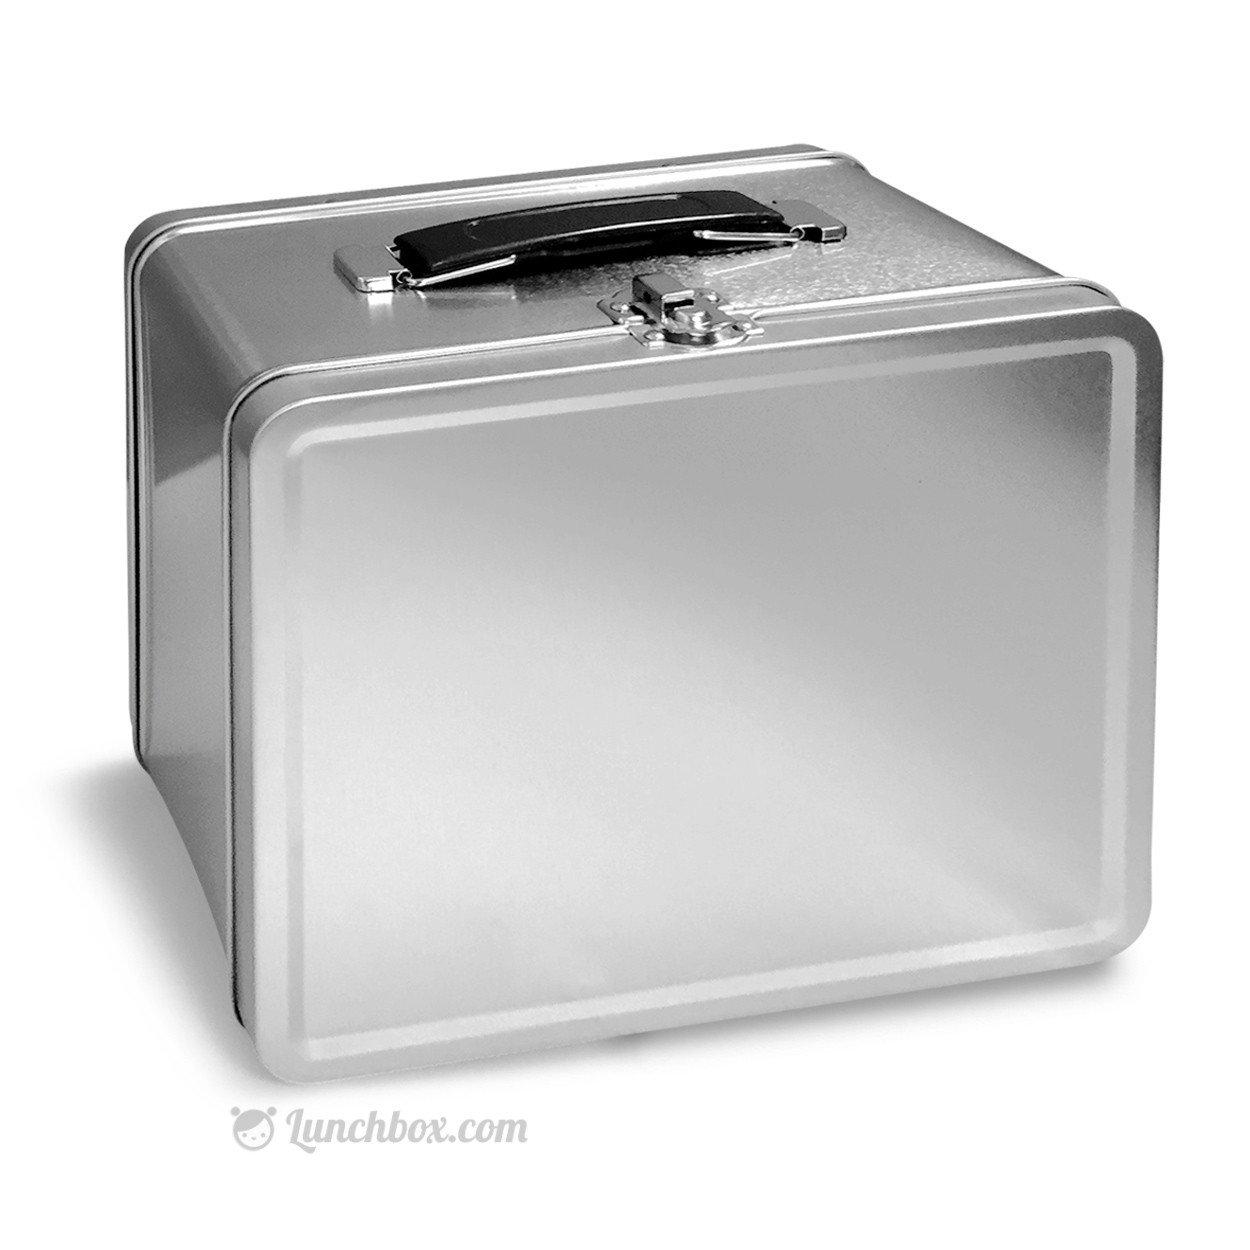 plainmetallunchbox.jpg